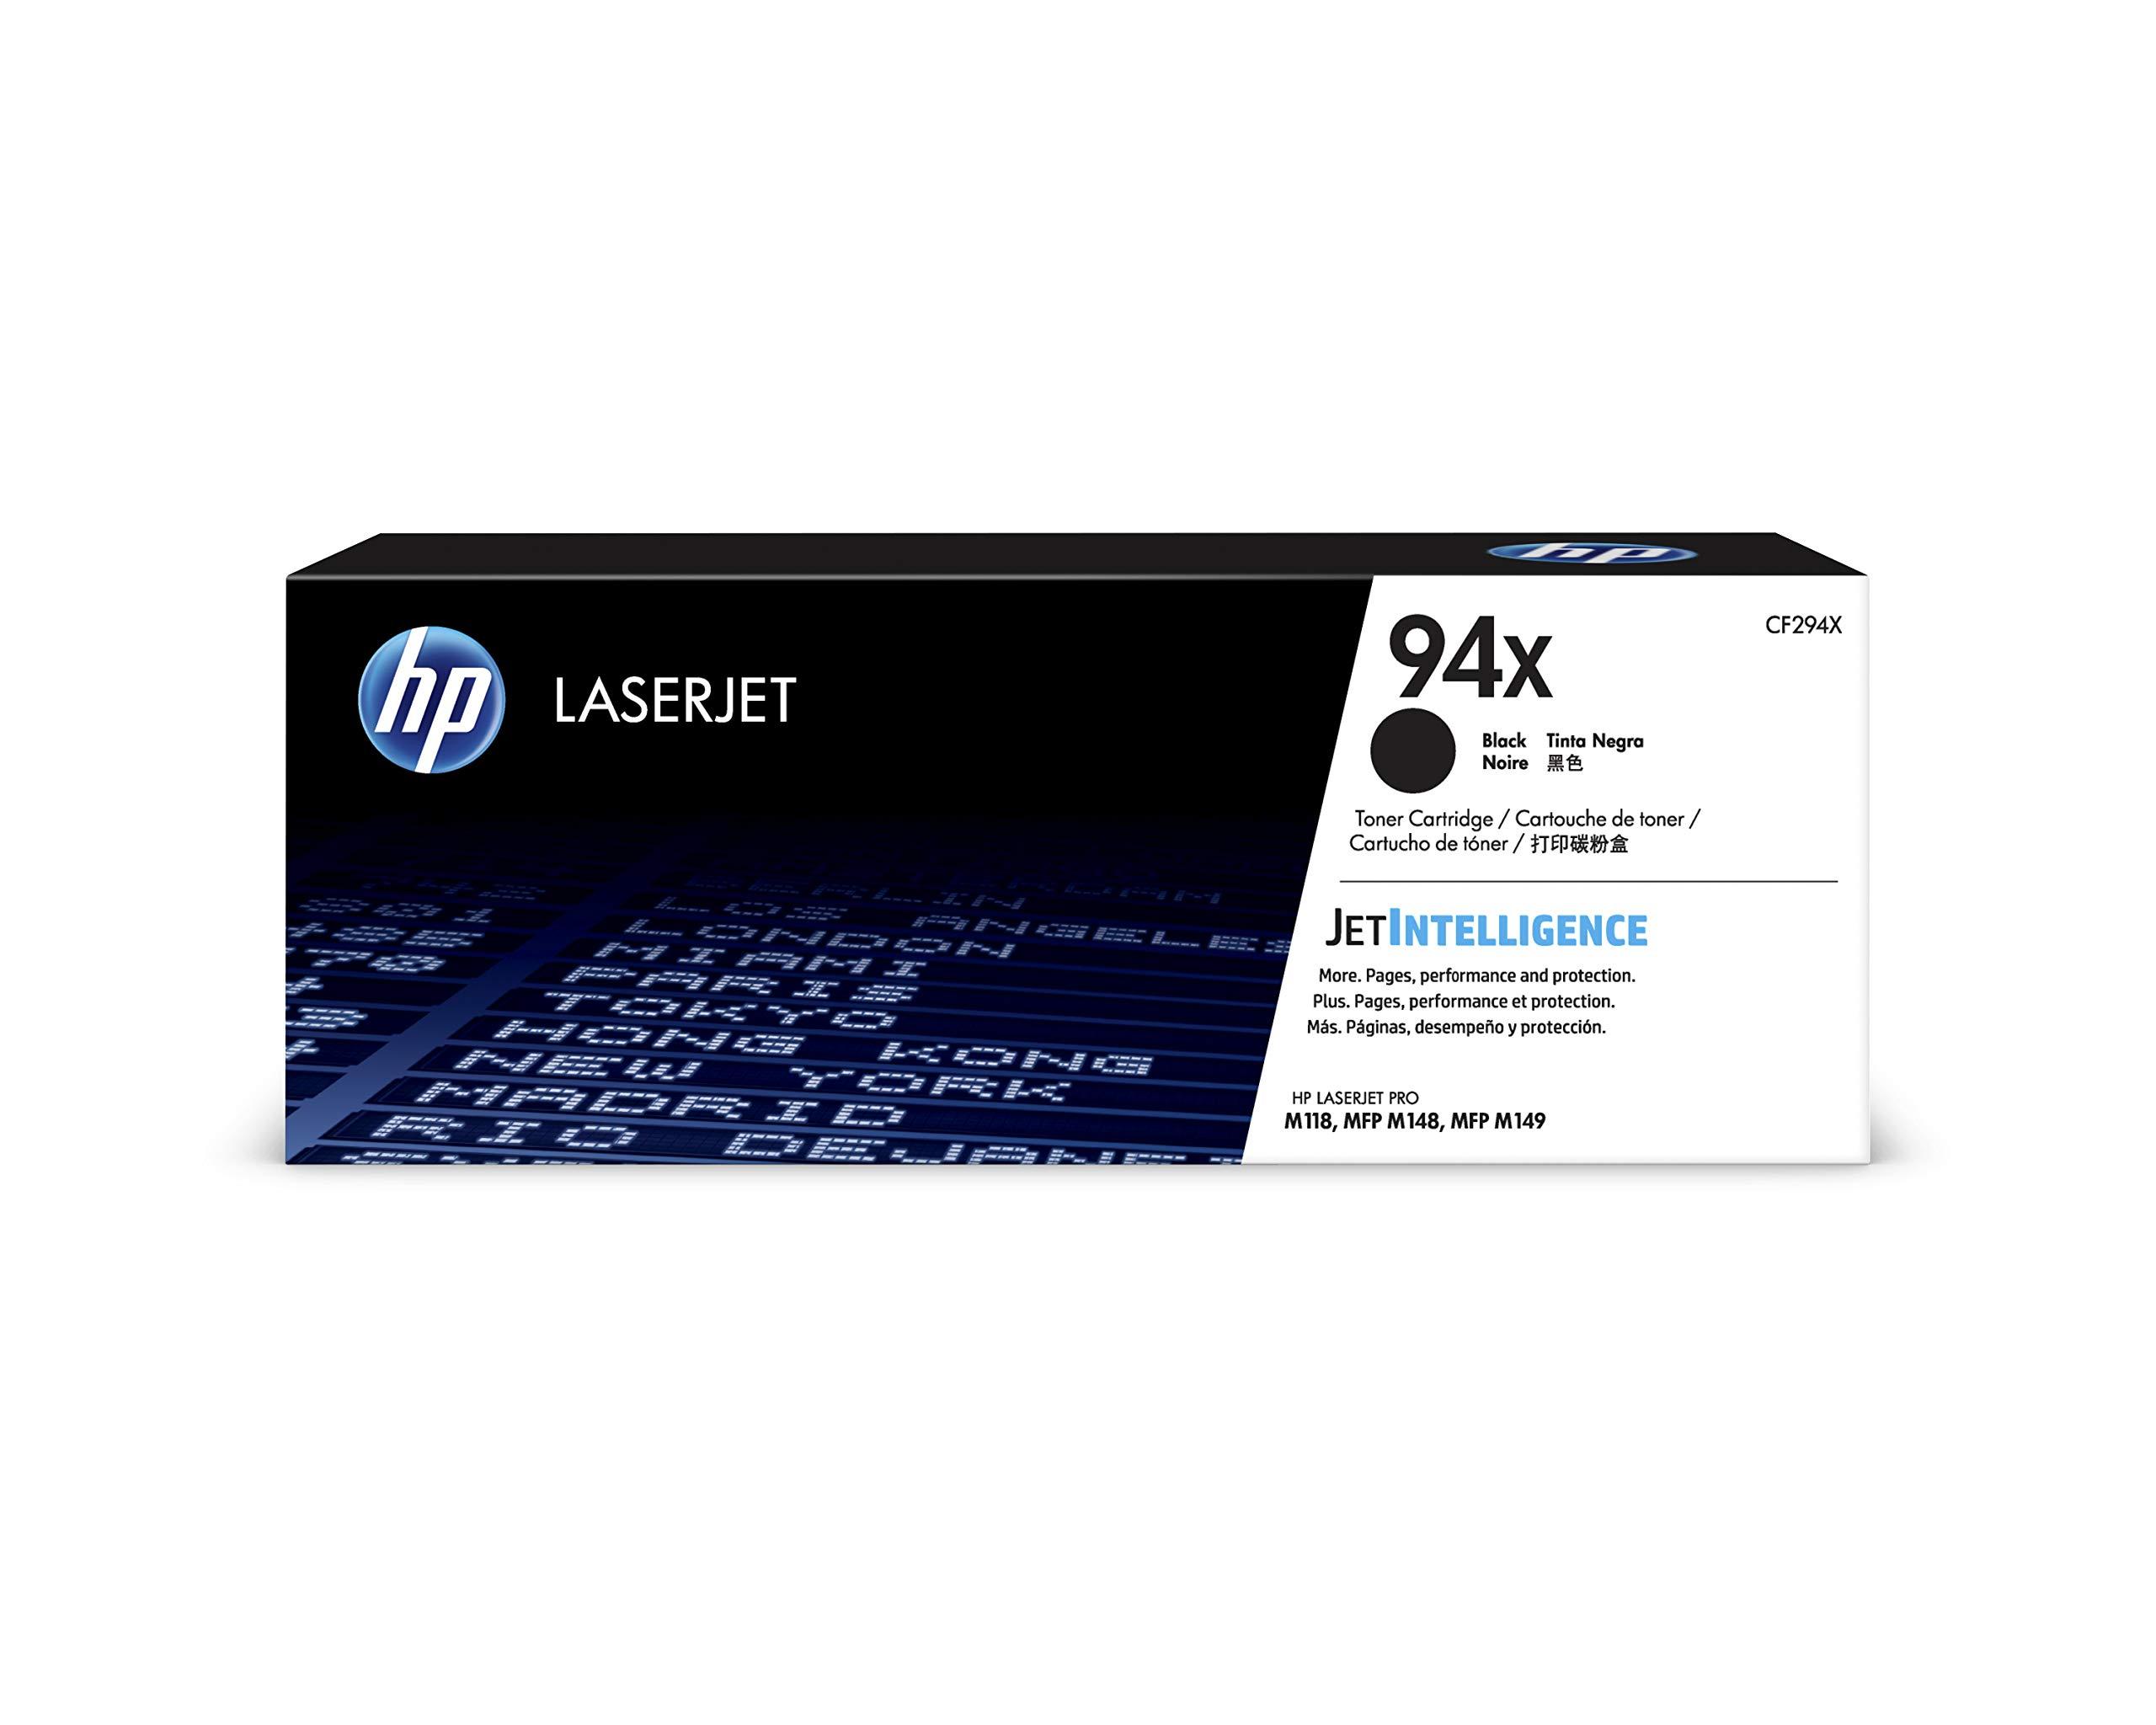 HP 94X | CF294X | Toner Cartridge | Black | High Yield by HP